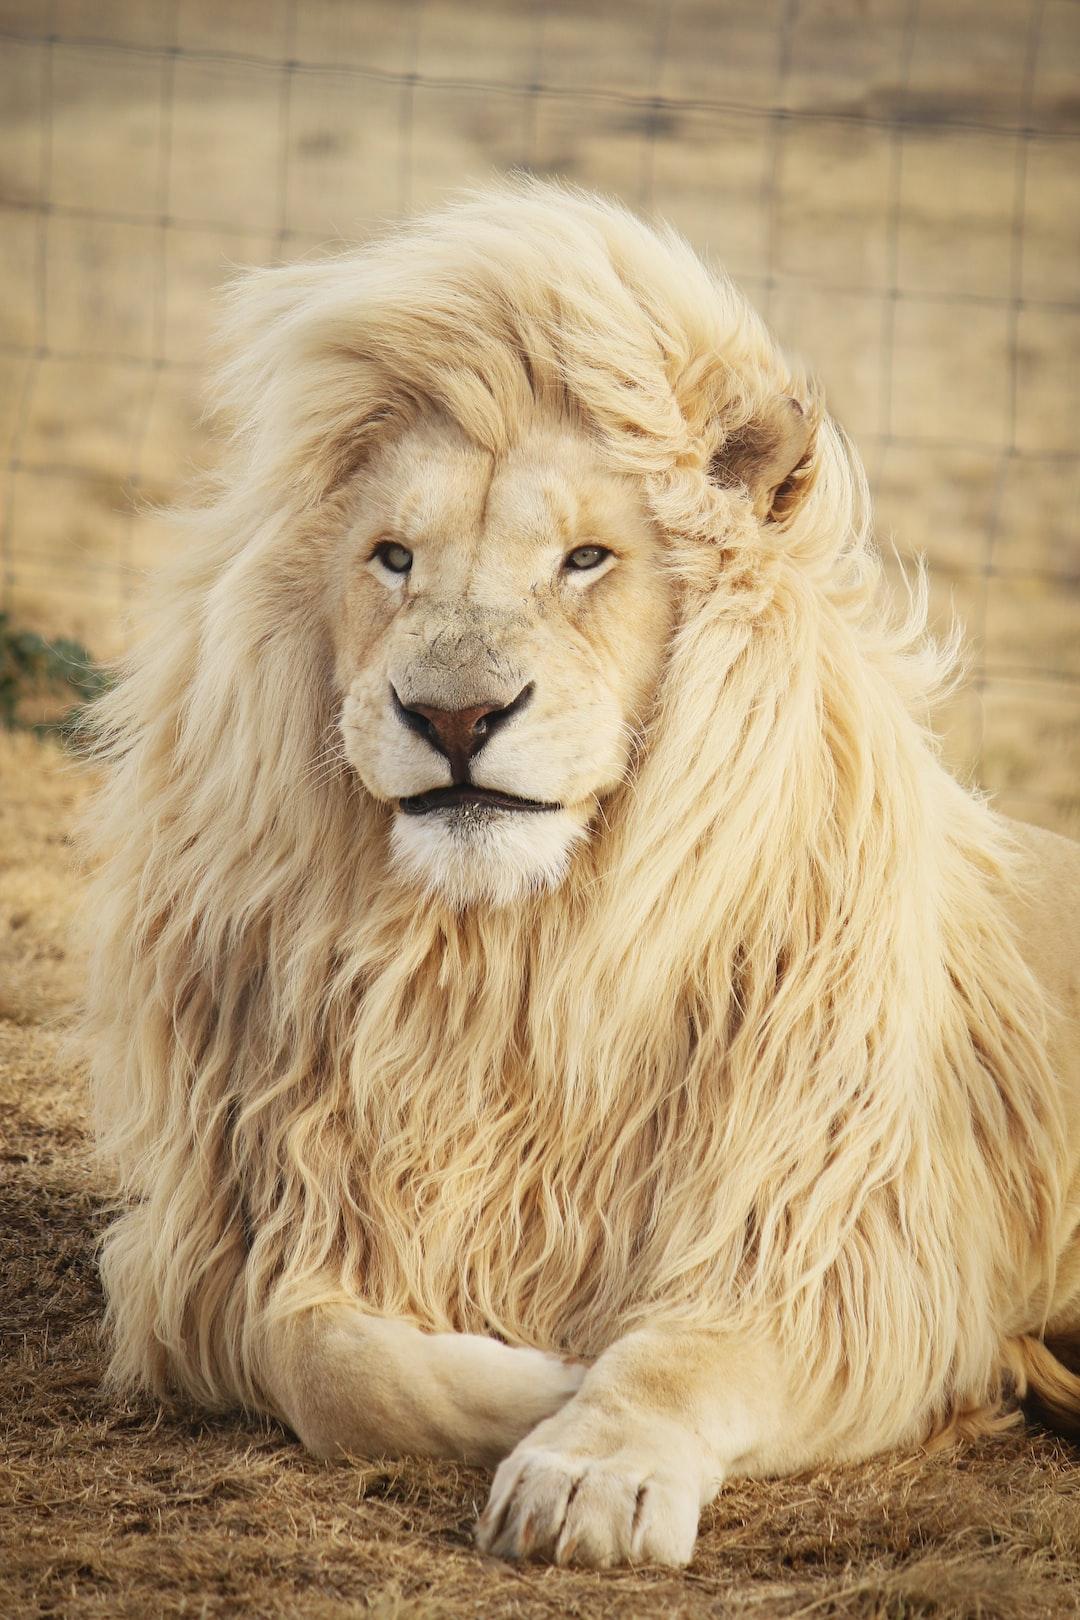 Lion Wallpapers: Free HD Download 500+ HQ | Unsplash